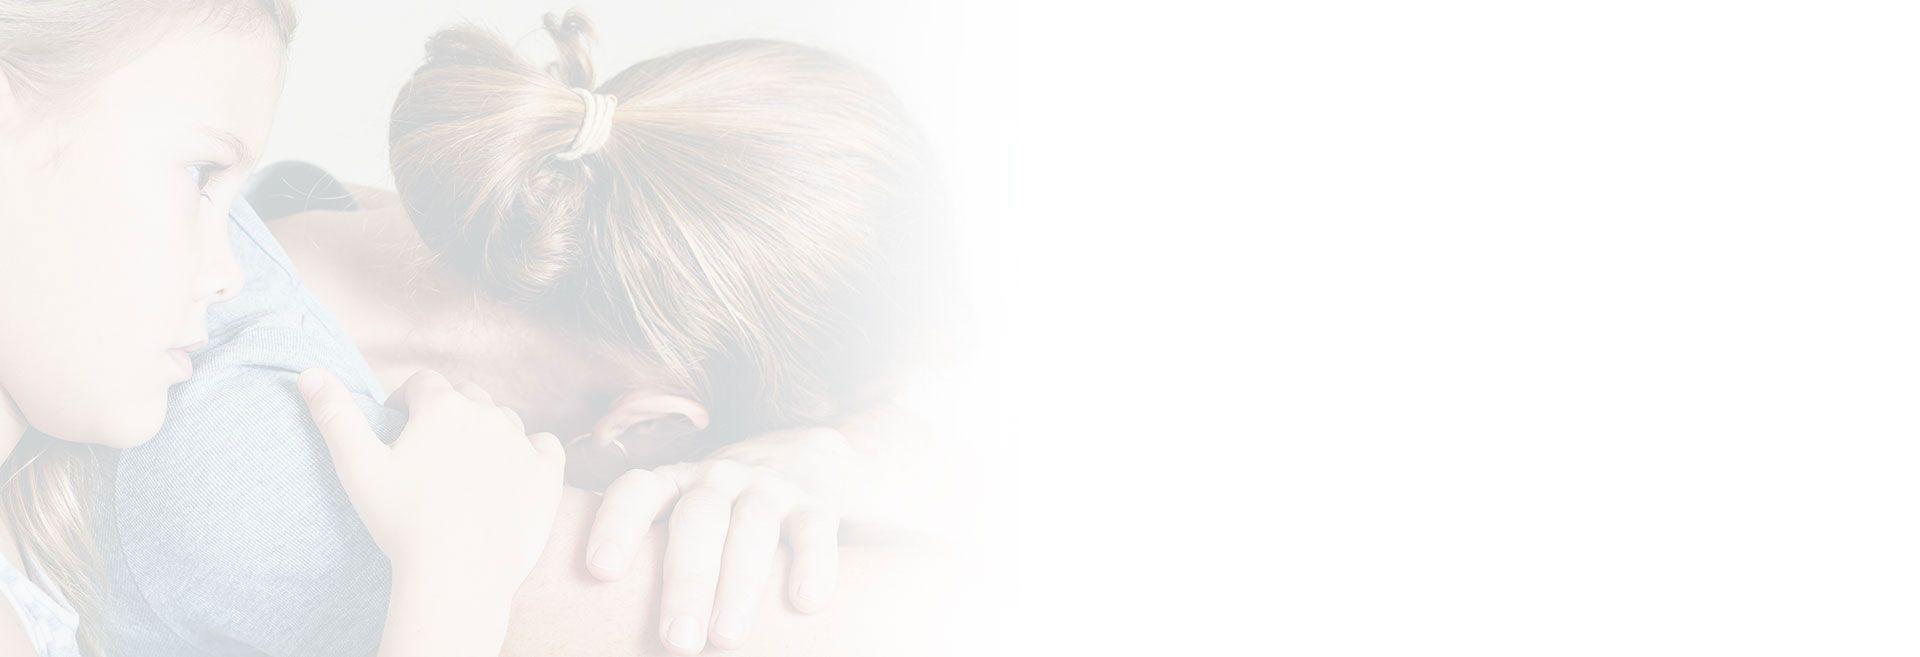 Domestic-Violence-image-5-Reverse